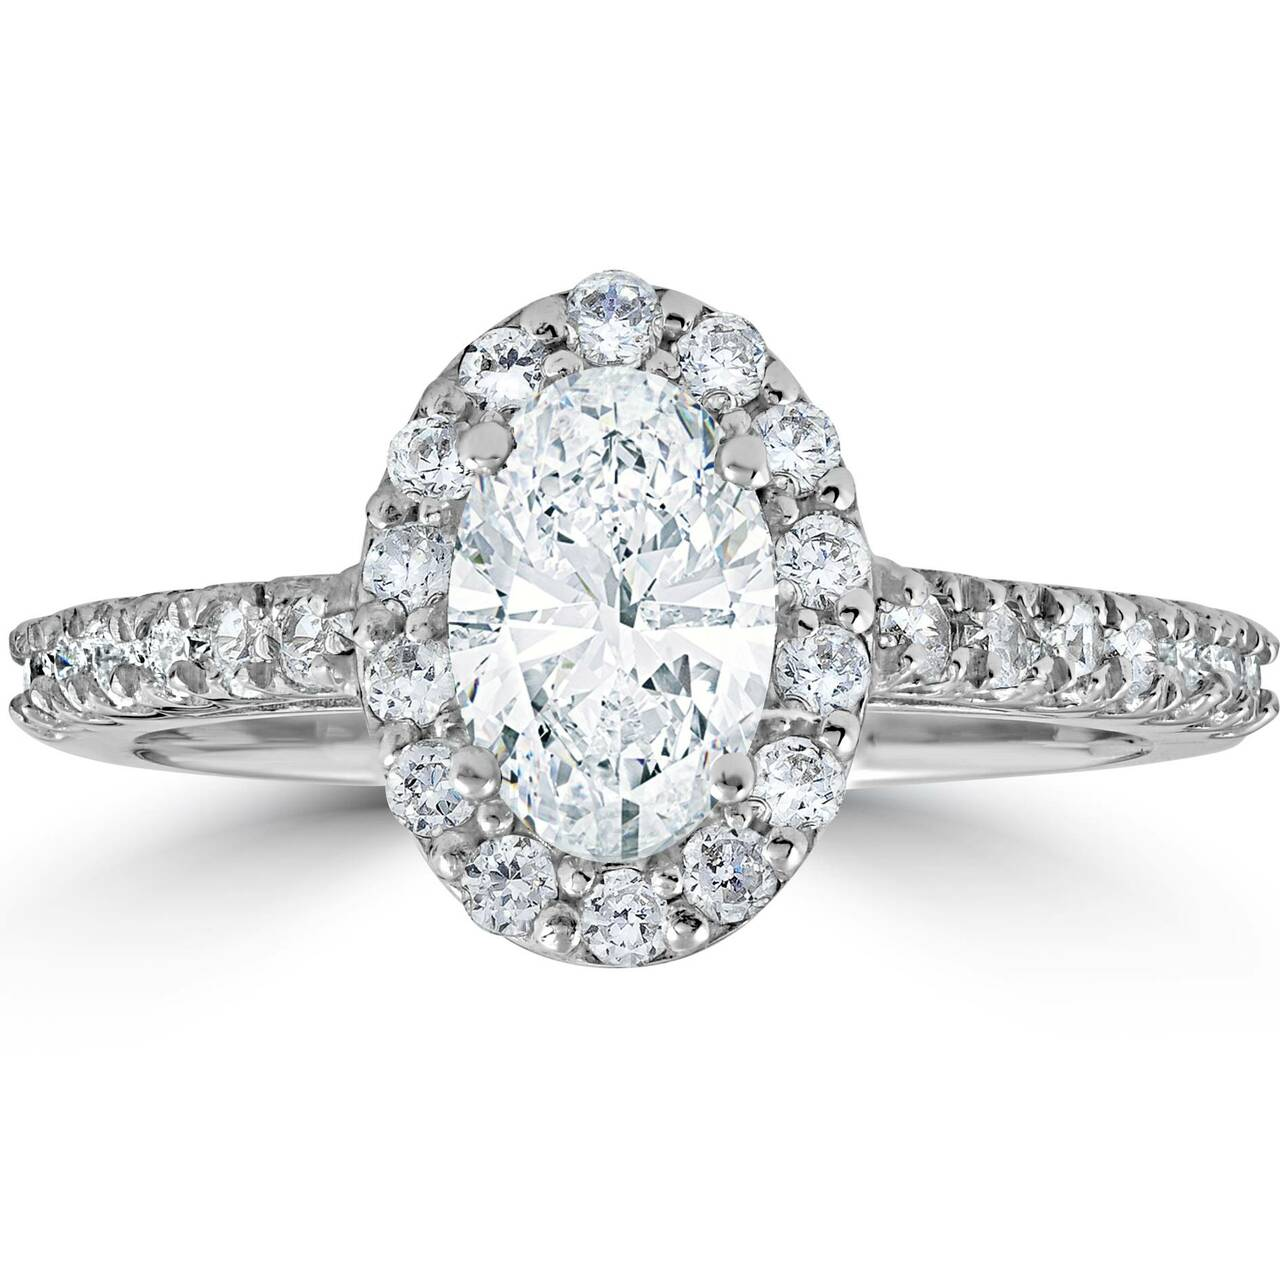 1 1 2ct Oval Clarity Enhanced Diamond Halo Engagement Ring 14K White Gold 02e619b3ae